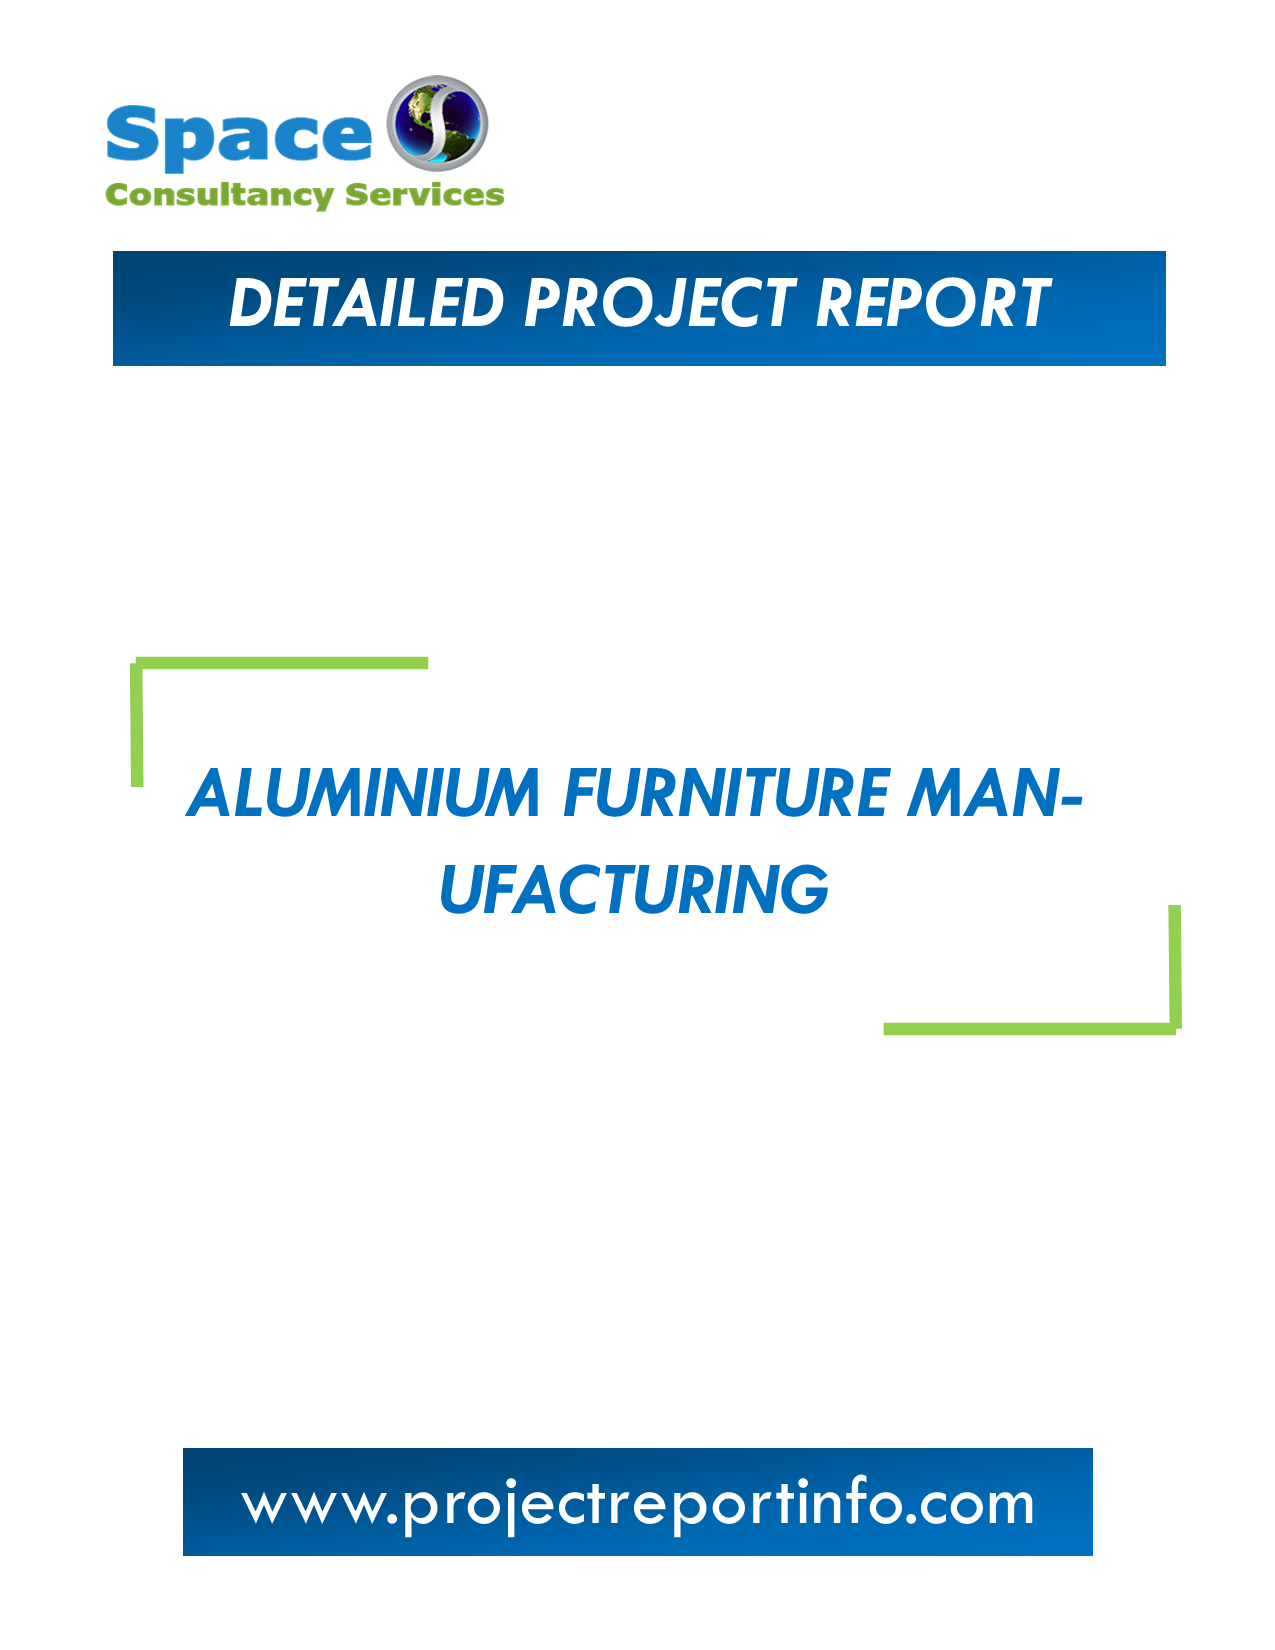 Project Report on Aluminium Furniture Manufacturing